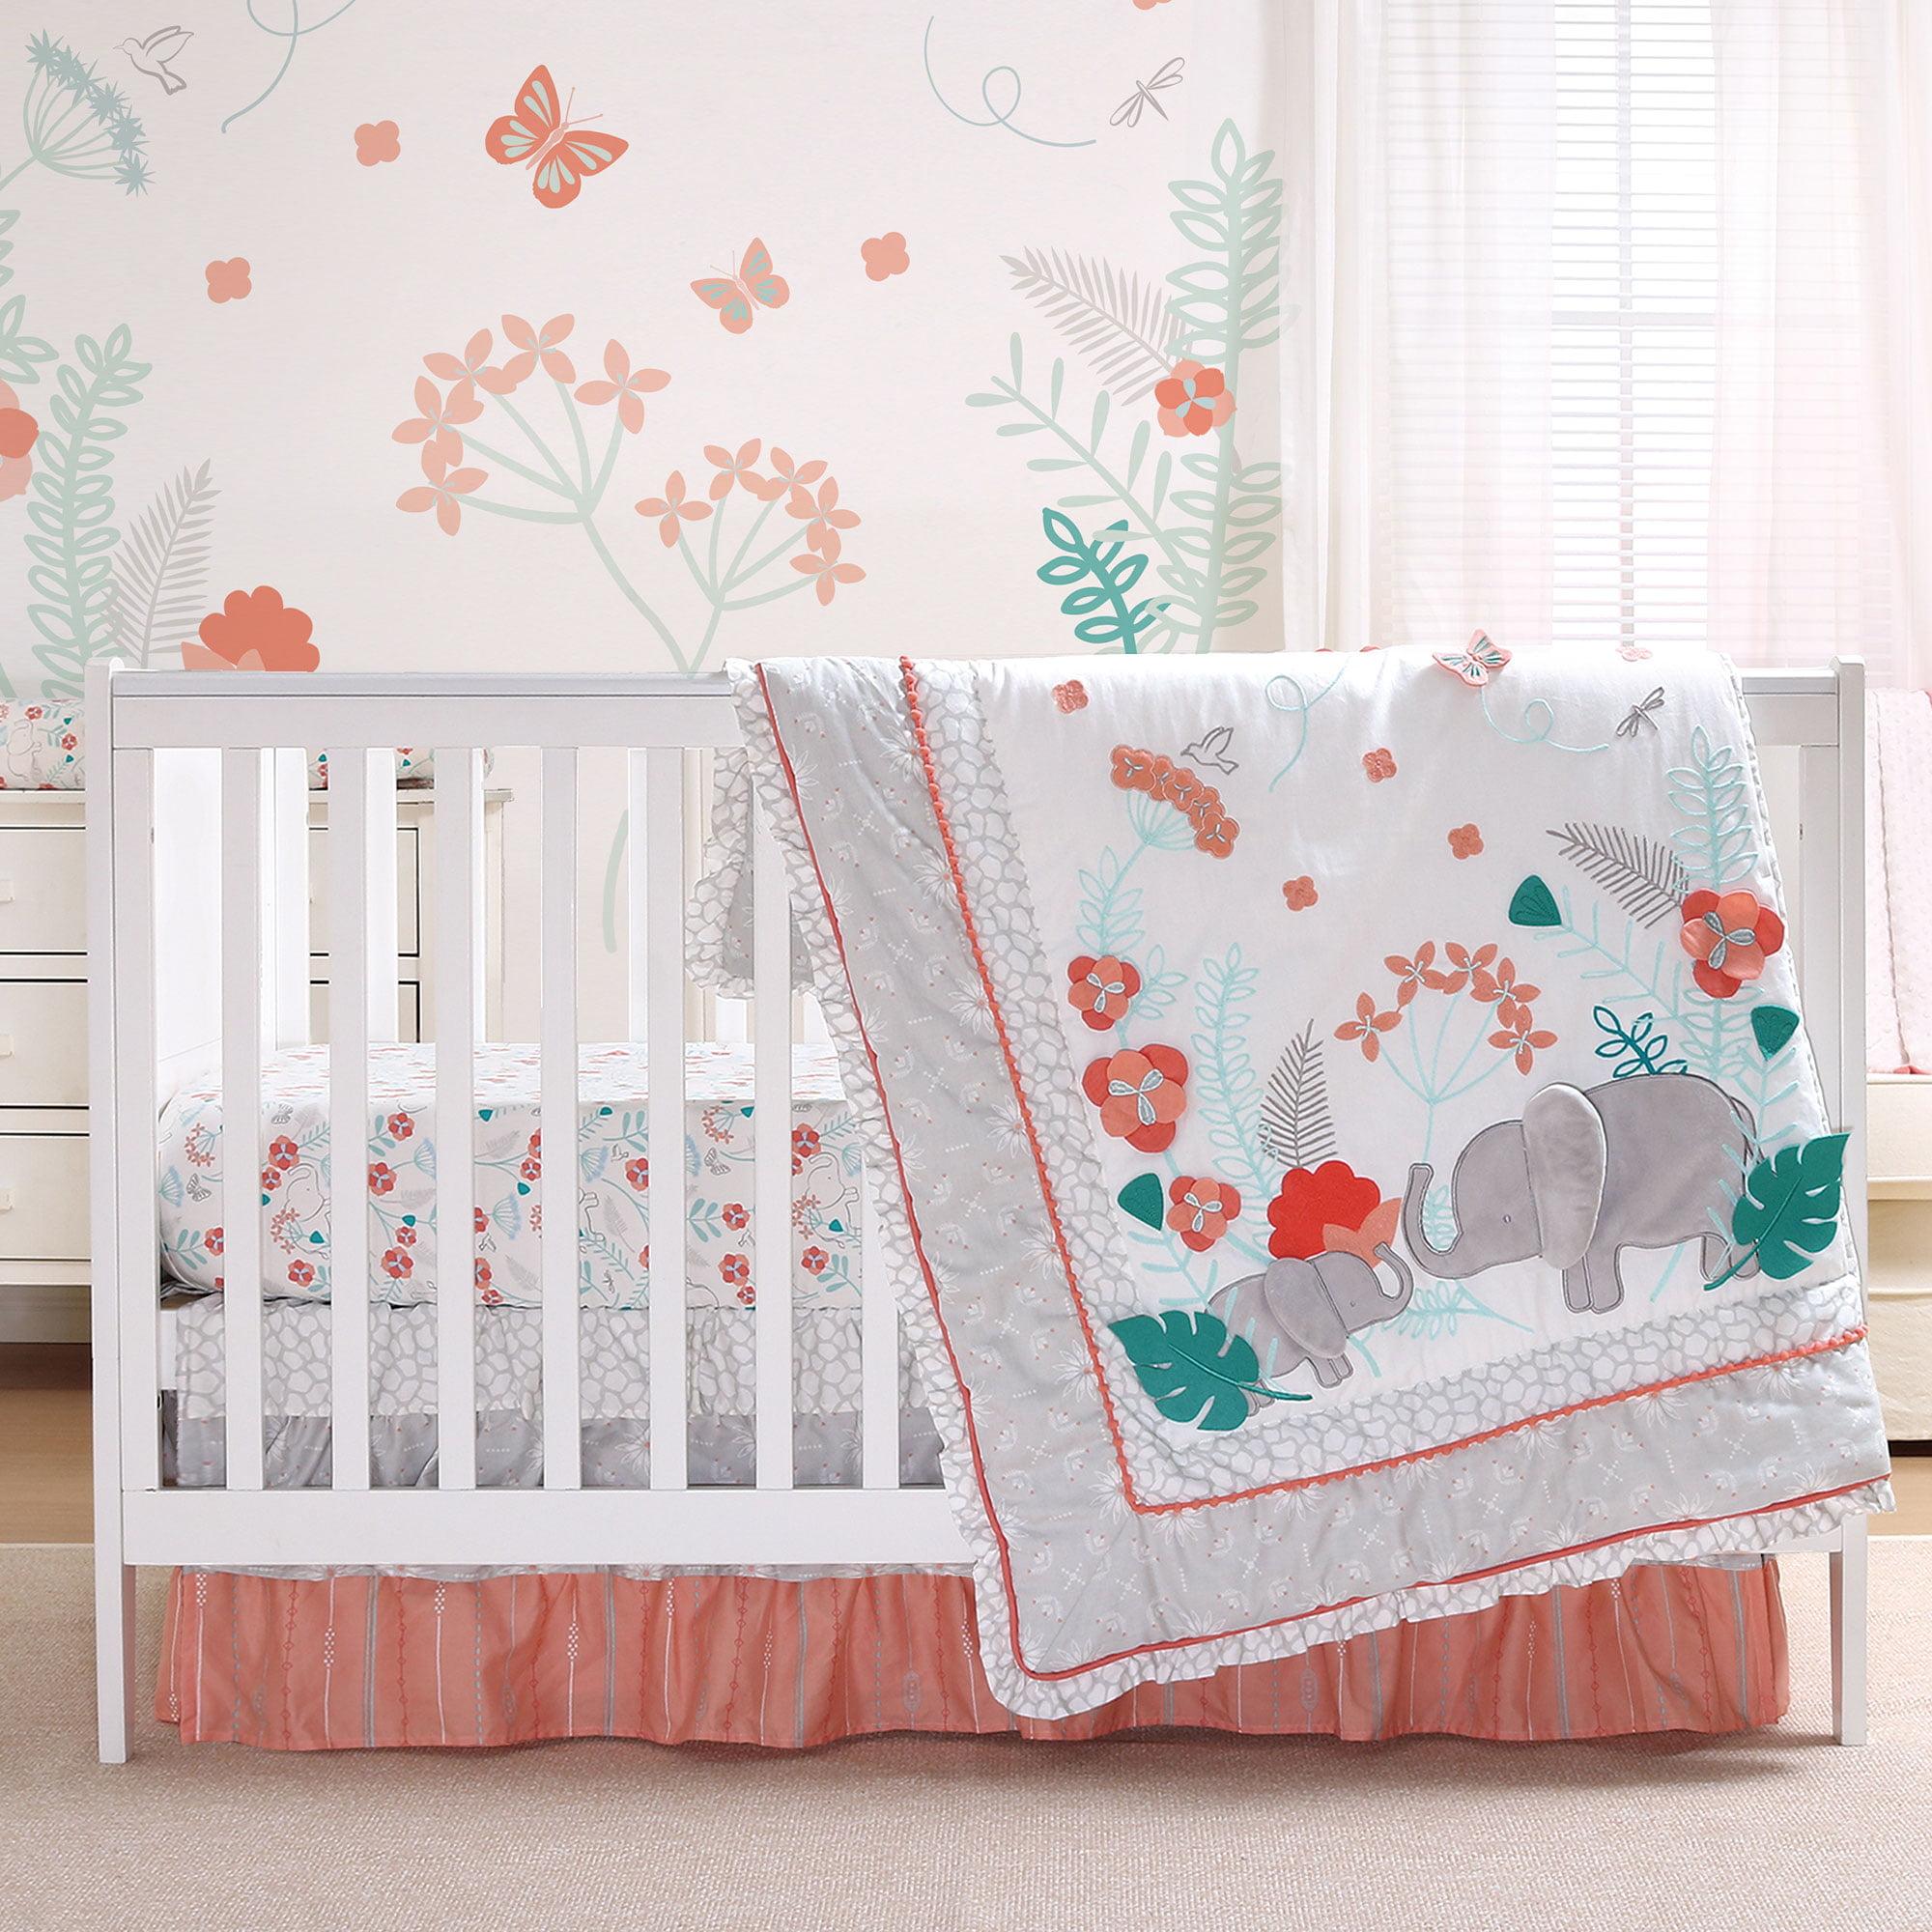 Safari Love 3 Piece Baby Girl Elephant Garden Crib Bedding Set by Peanut Shell